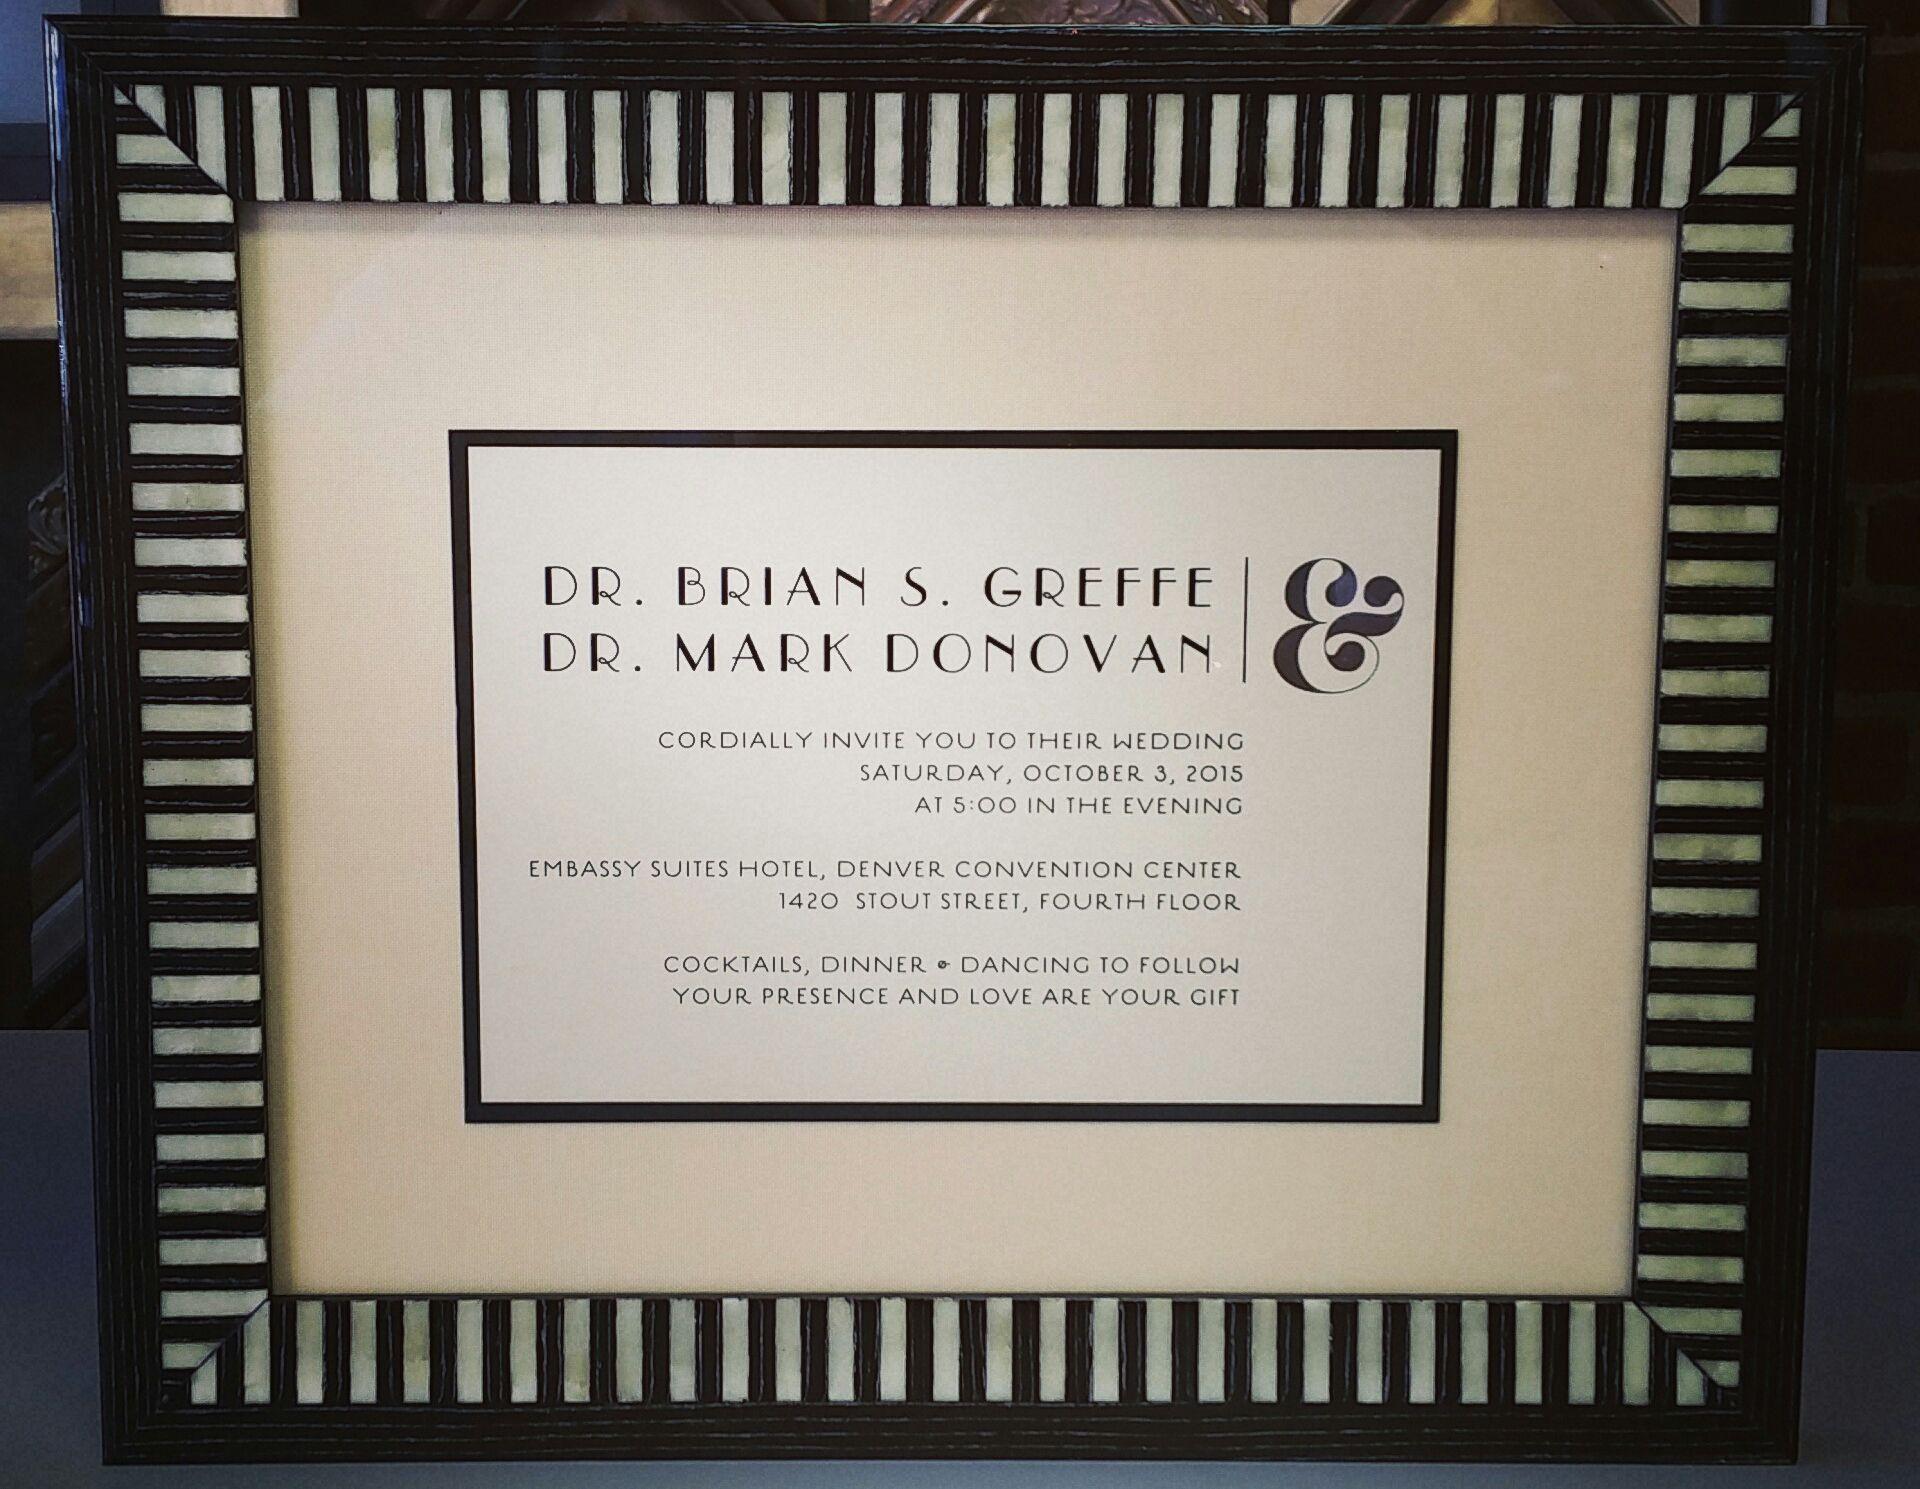 Custom framed wedding invitation using two acid-free mats, museum ...